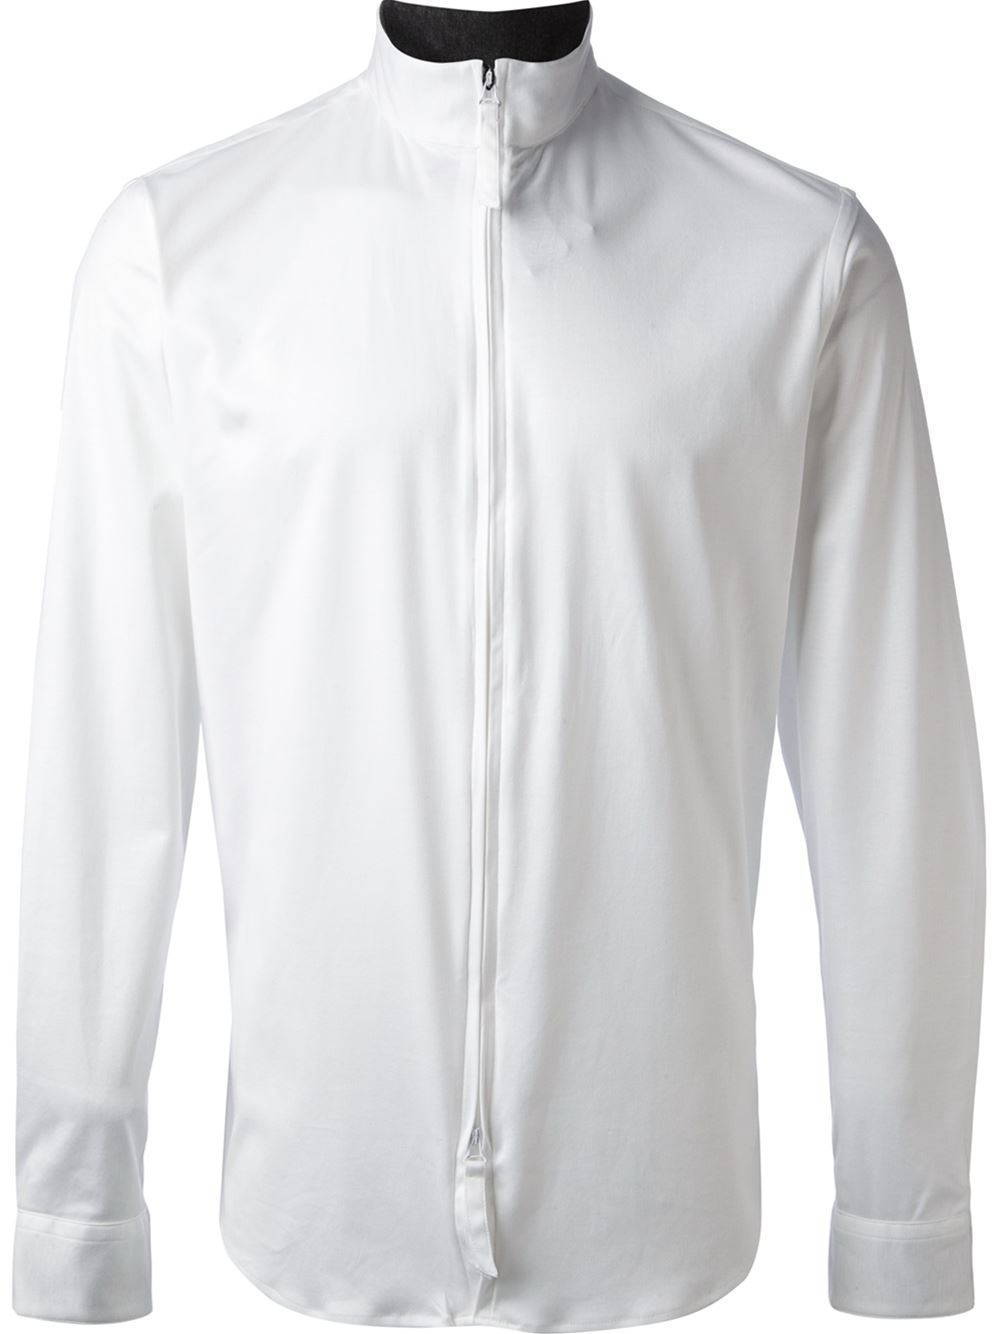 lyst giorgio armani zipped shirt in white for men